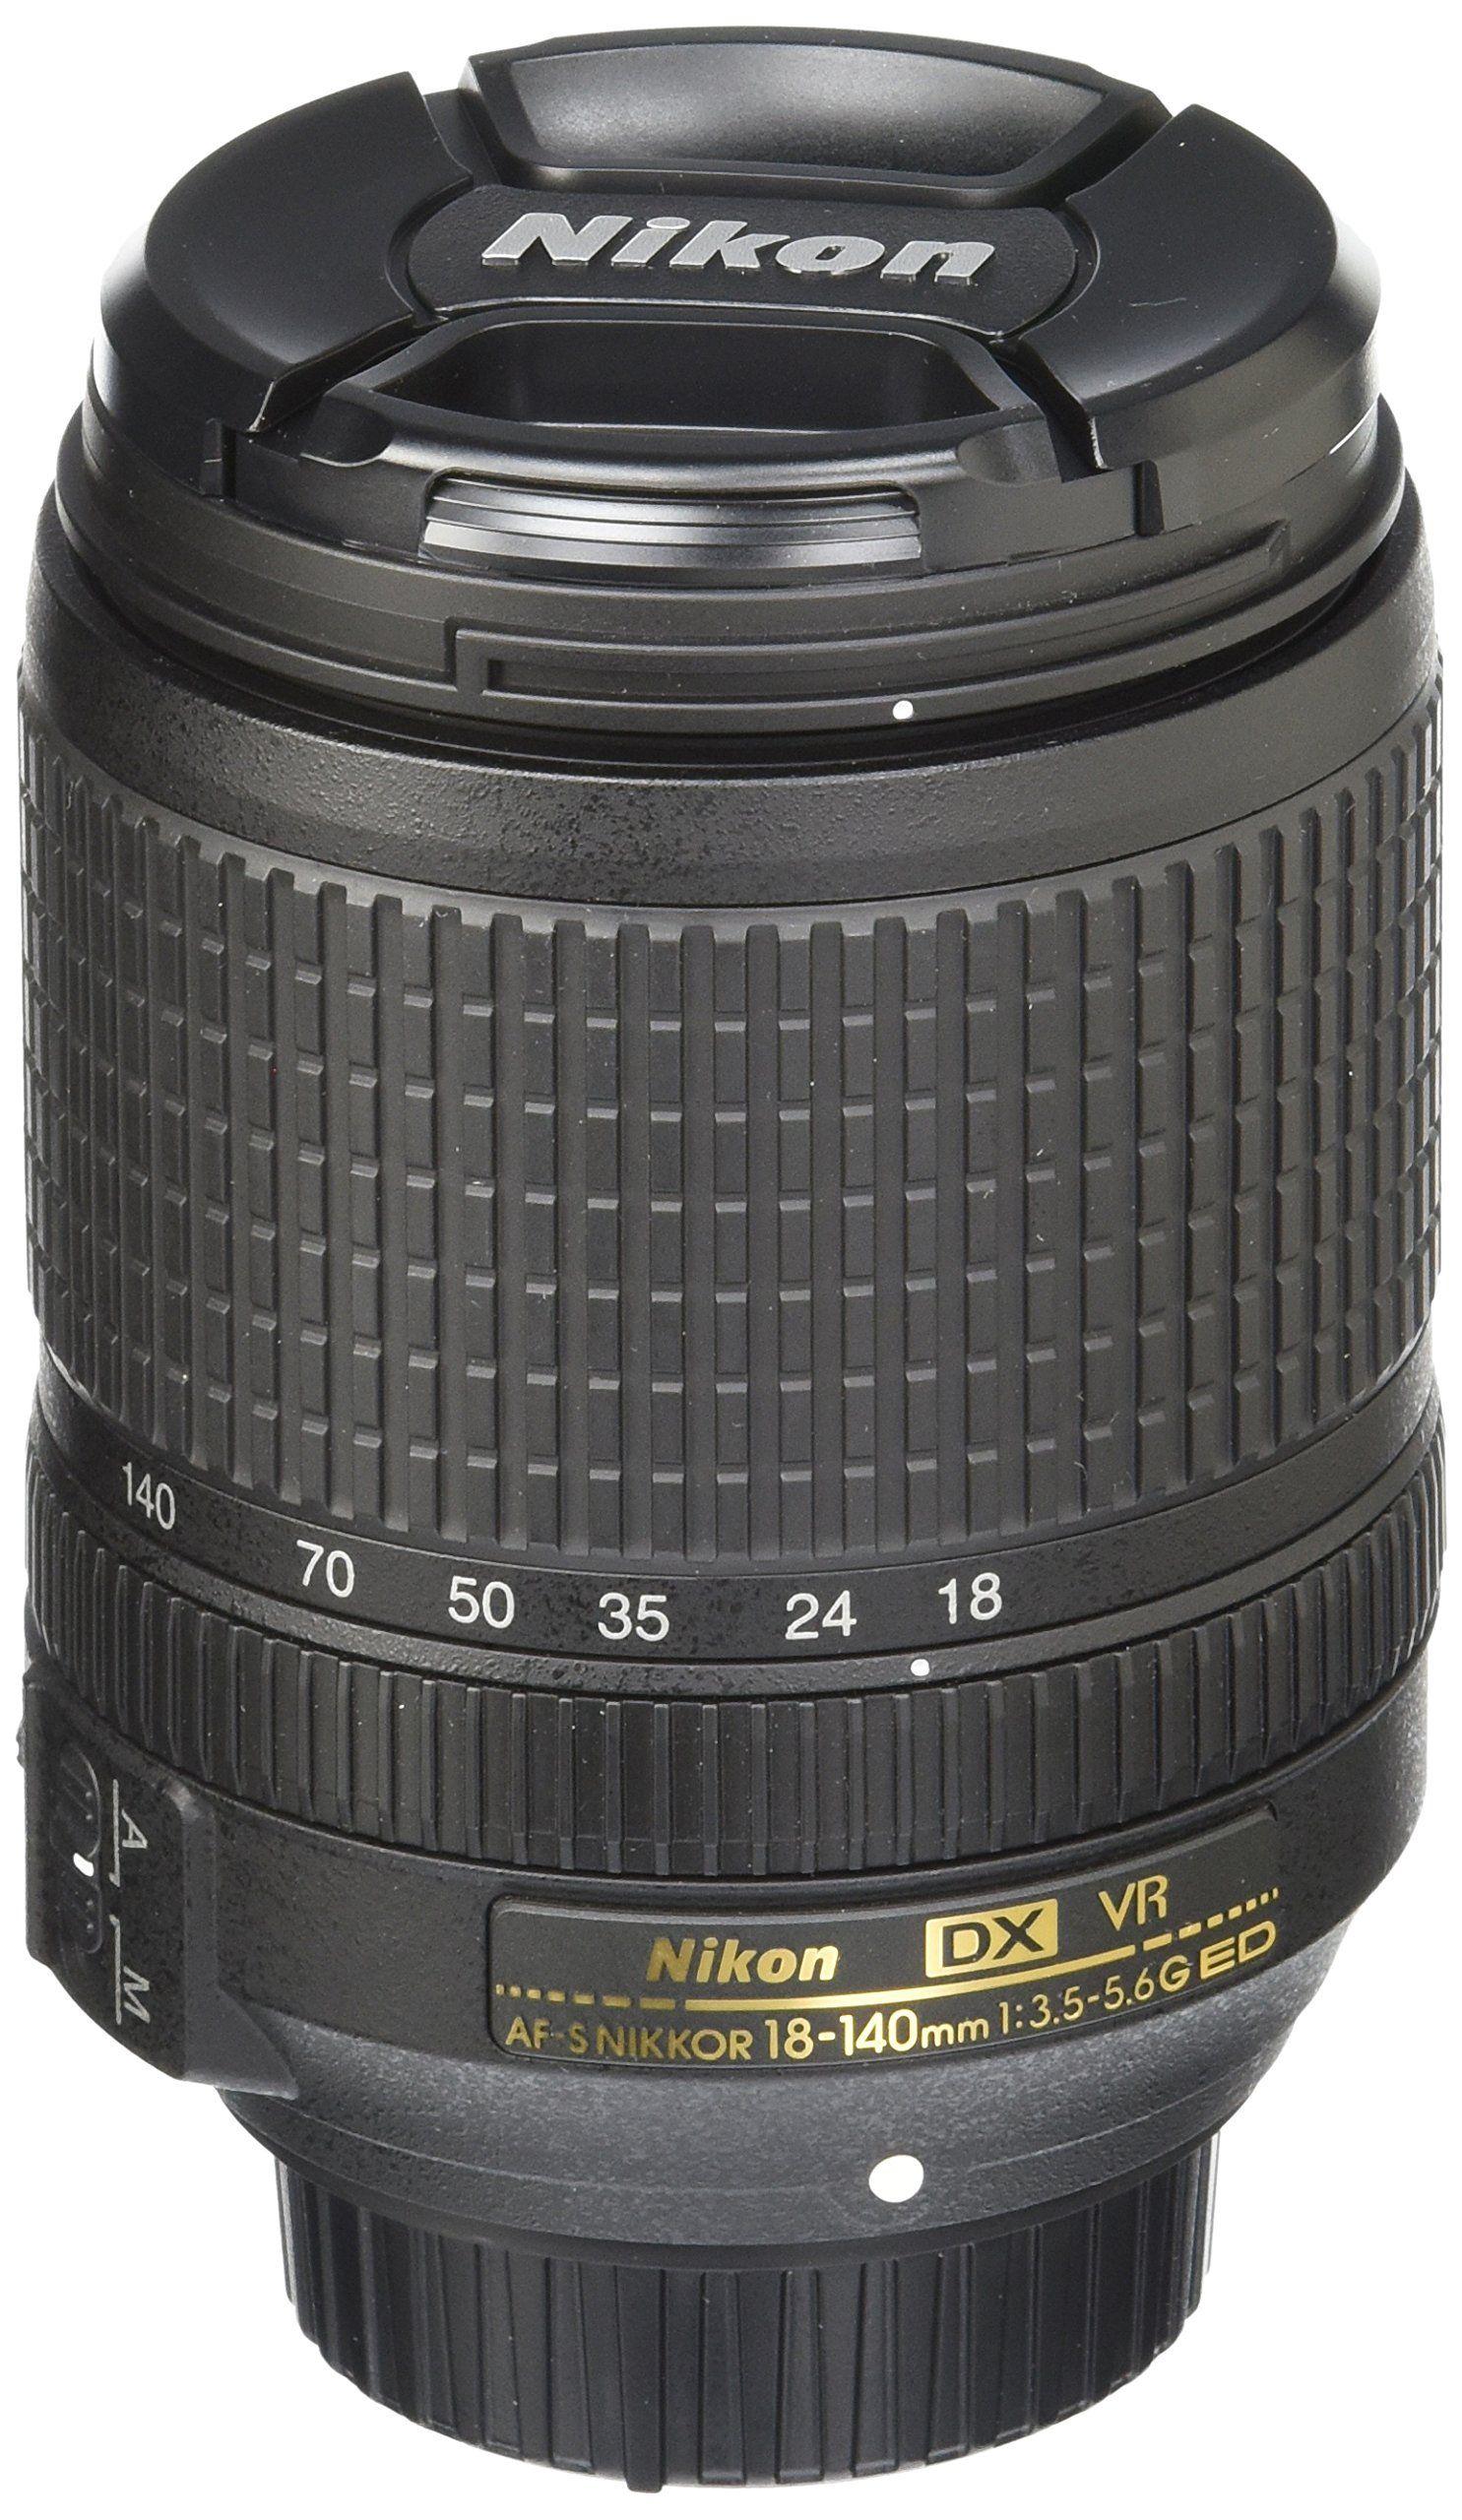 Amazon Com Nikon Af S Dx Nikkor 18 140mm F 3 5 5 6g Ed Vibration Reduction Zoom Lens With Auto Focu Nikon Dslr Camera Dslr Camera Reviews Nikon Camera Lenses